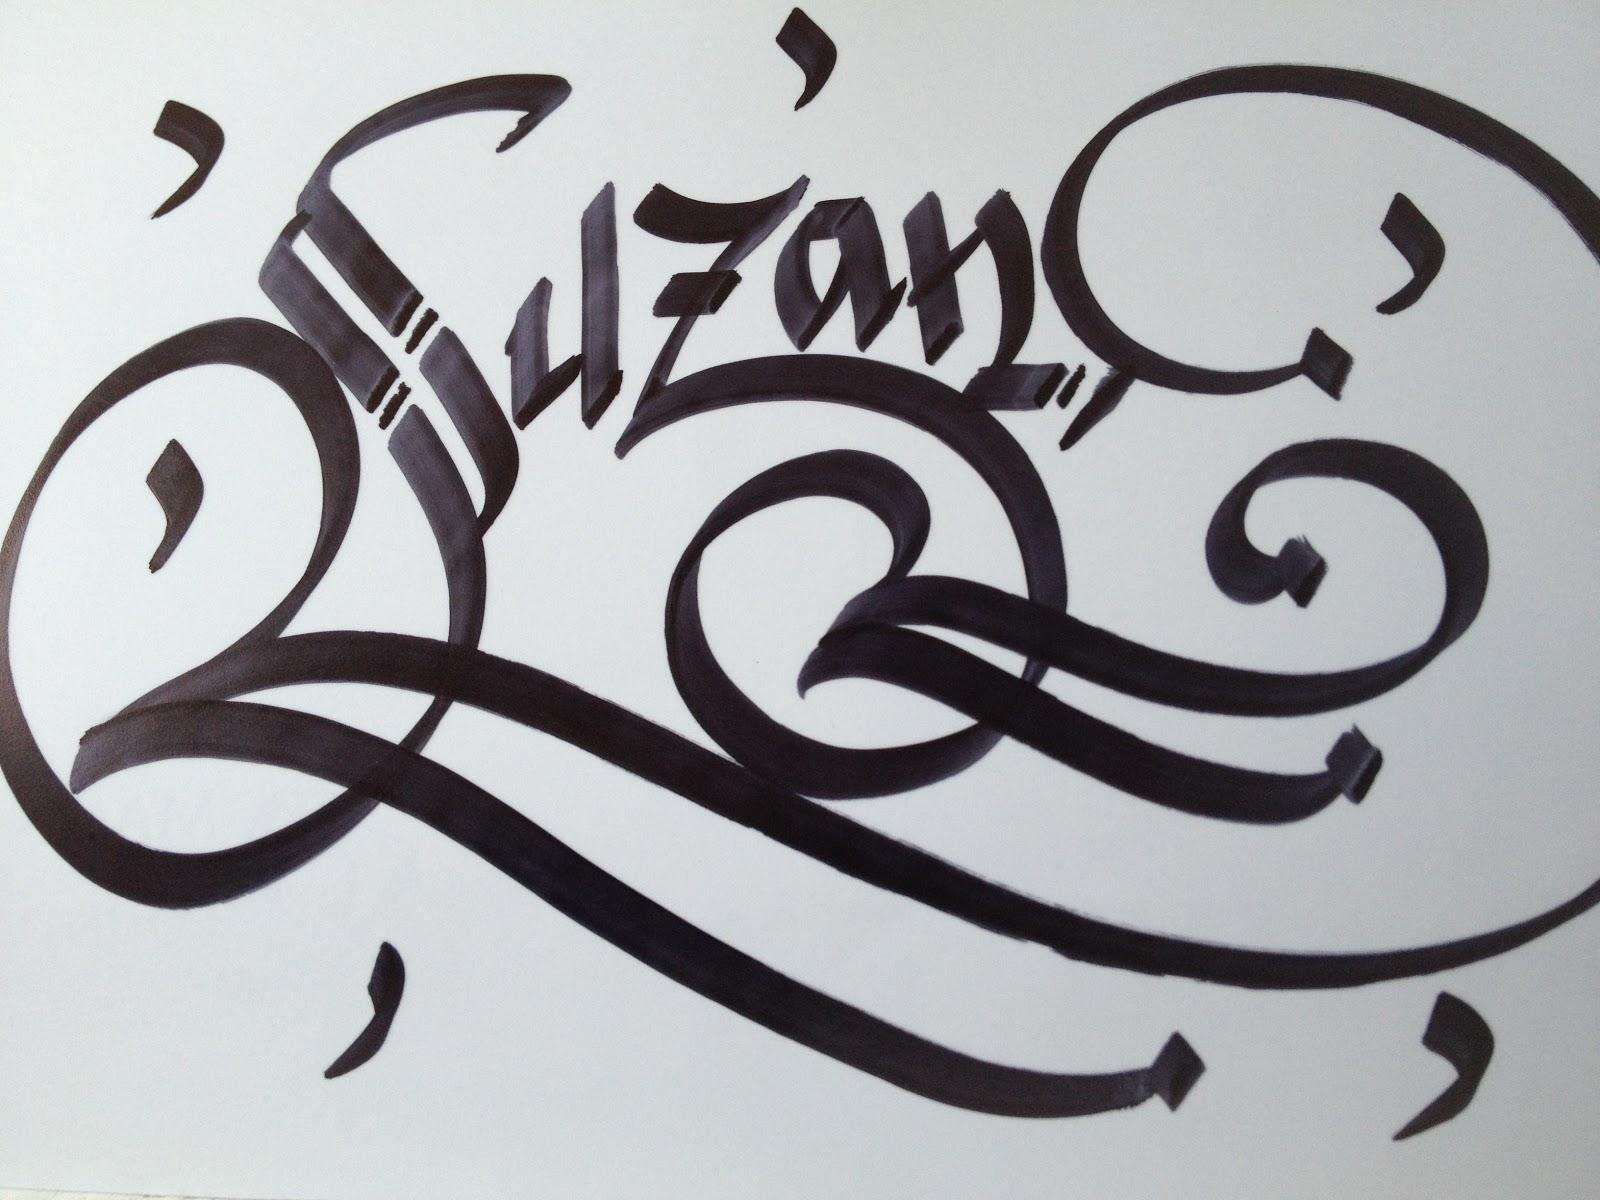 Calligraphy art girl names in jennifer